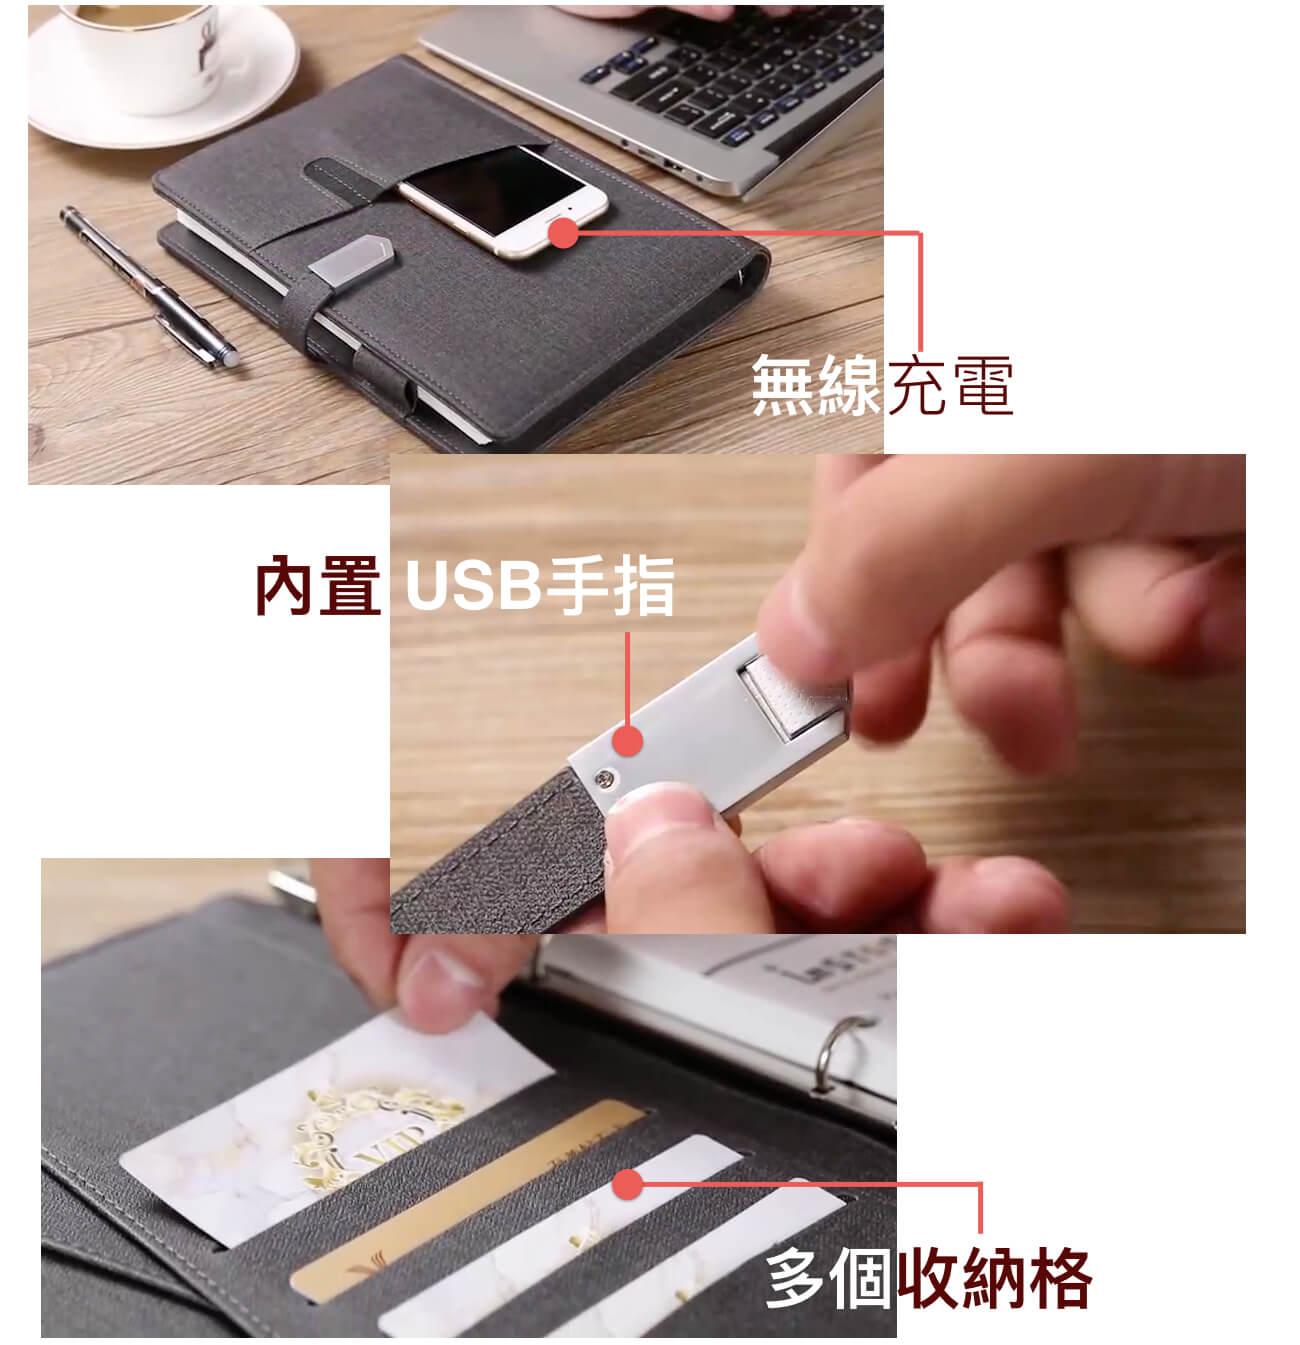 imStone Smart Binder Wireless Charging Binder 手冊 智能手冊 石頭紙 香港 SearchingC 台灣 hk 012